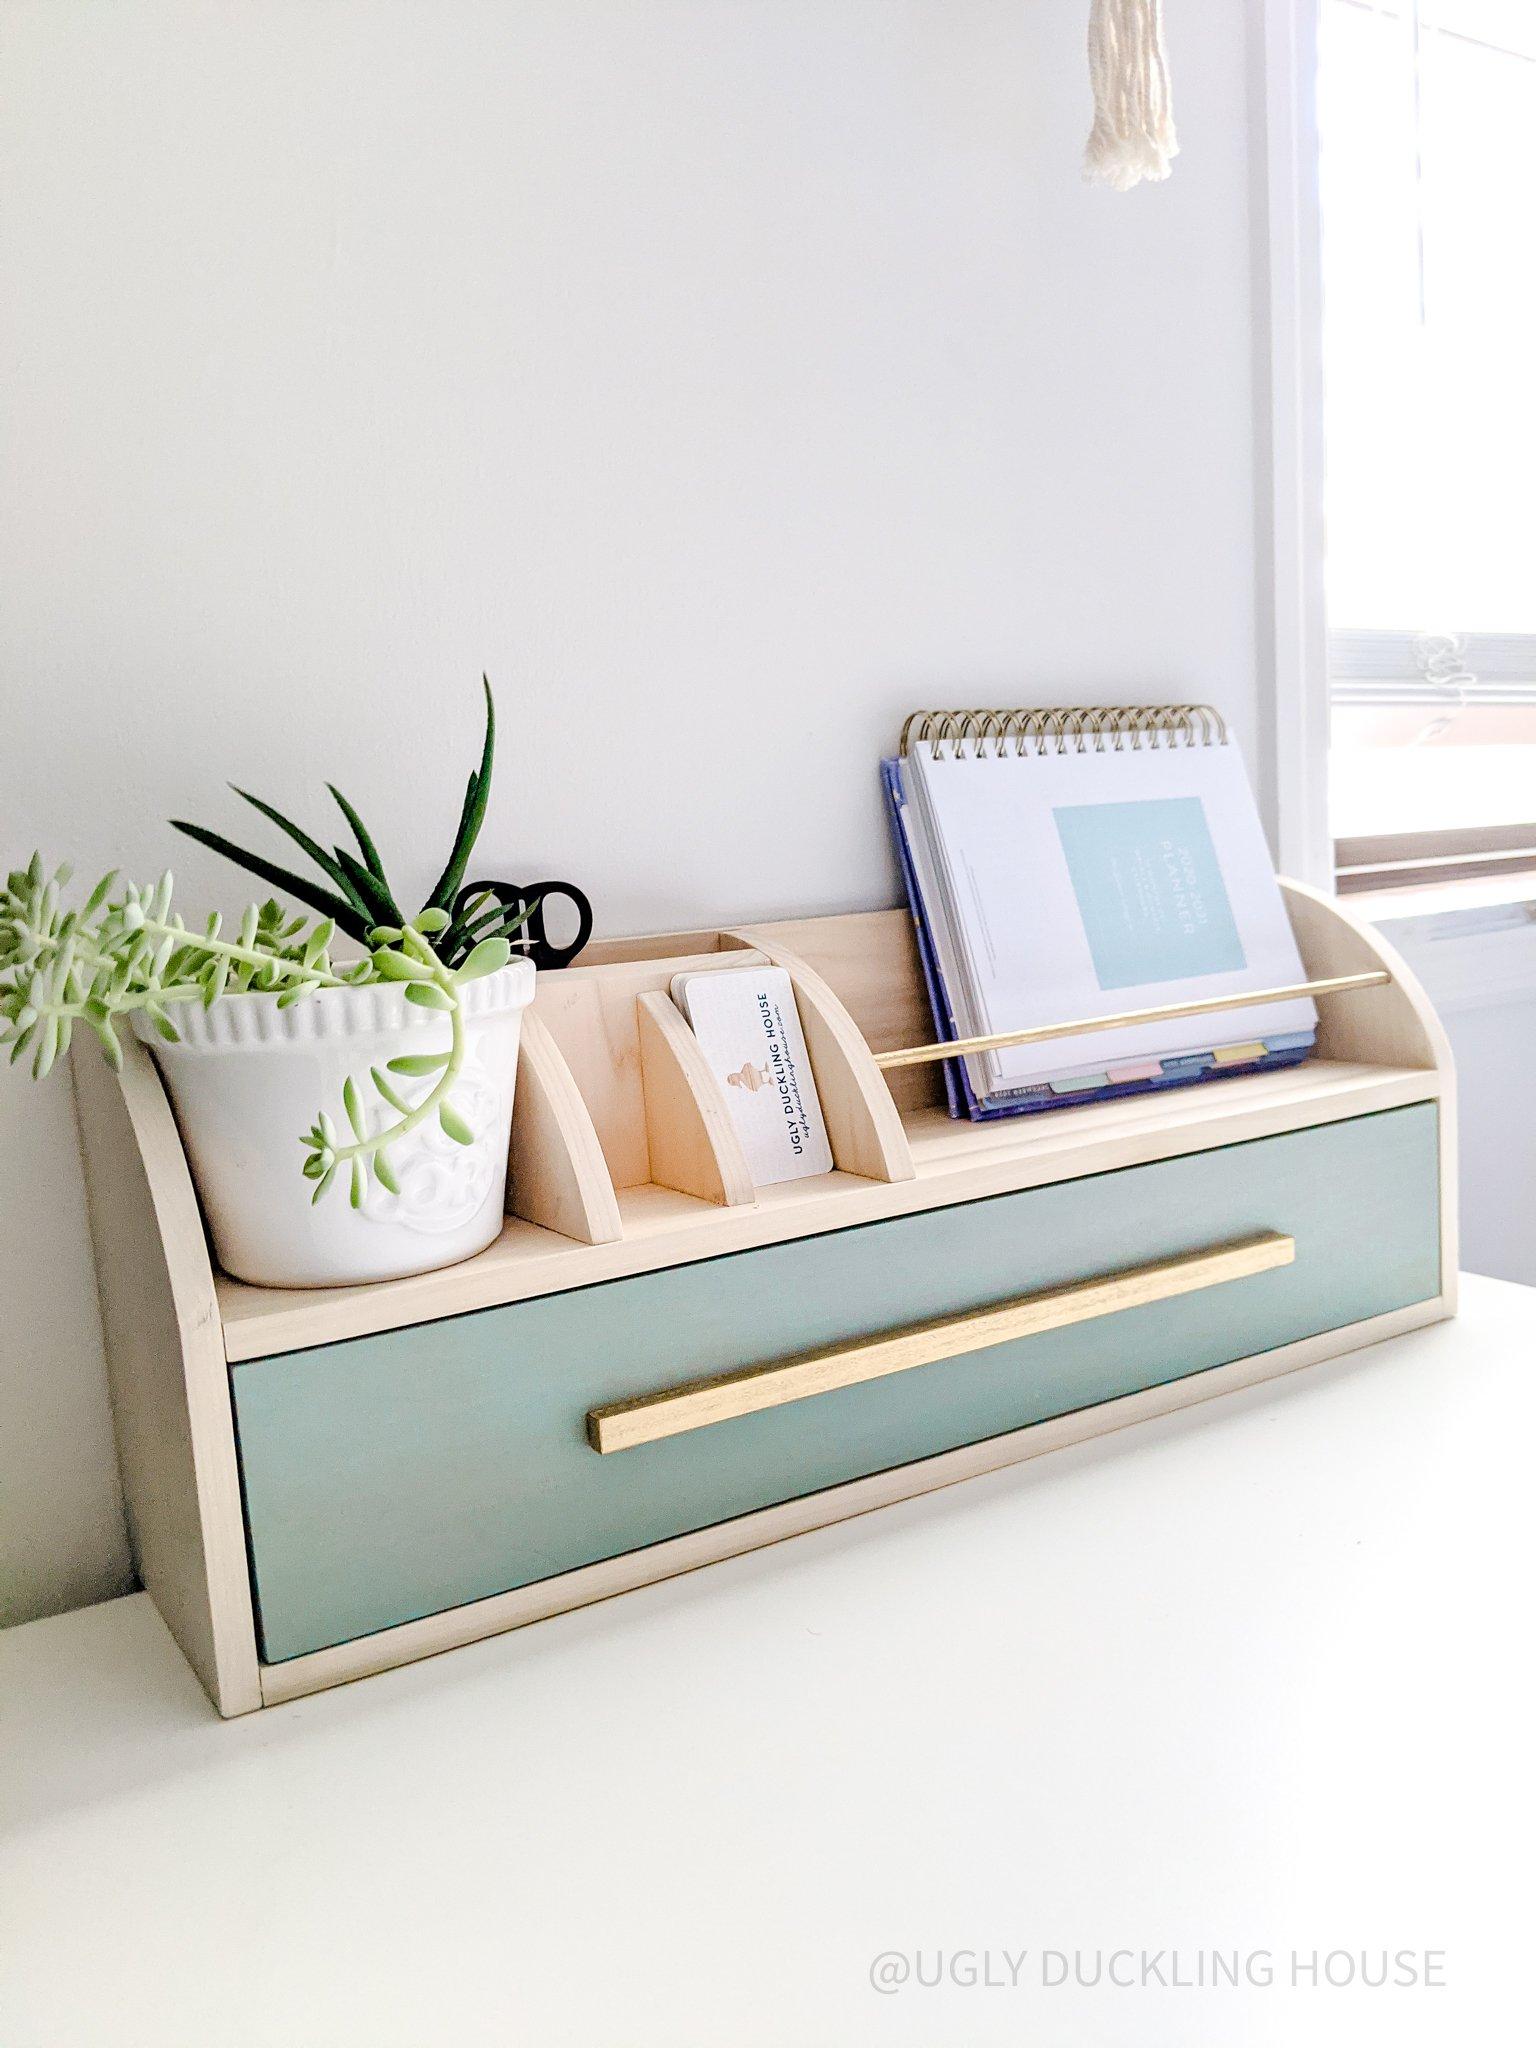 DIY Desk Organizer | Free Plans